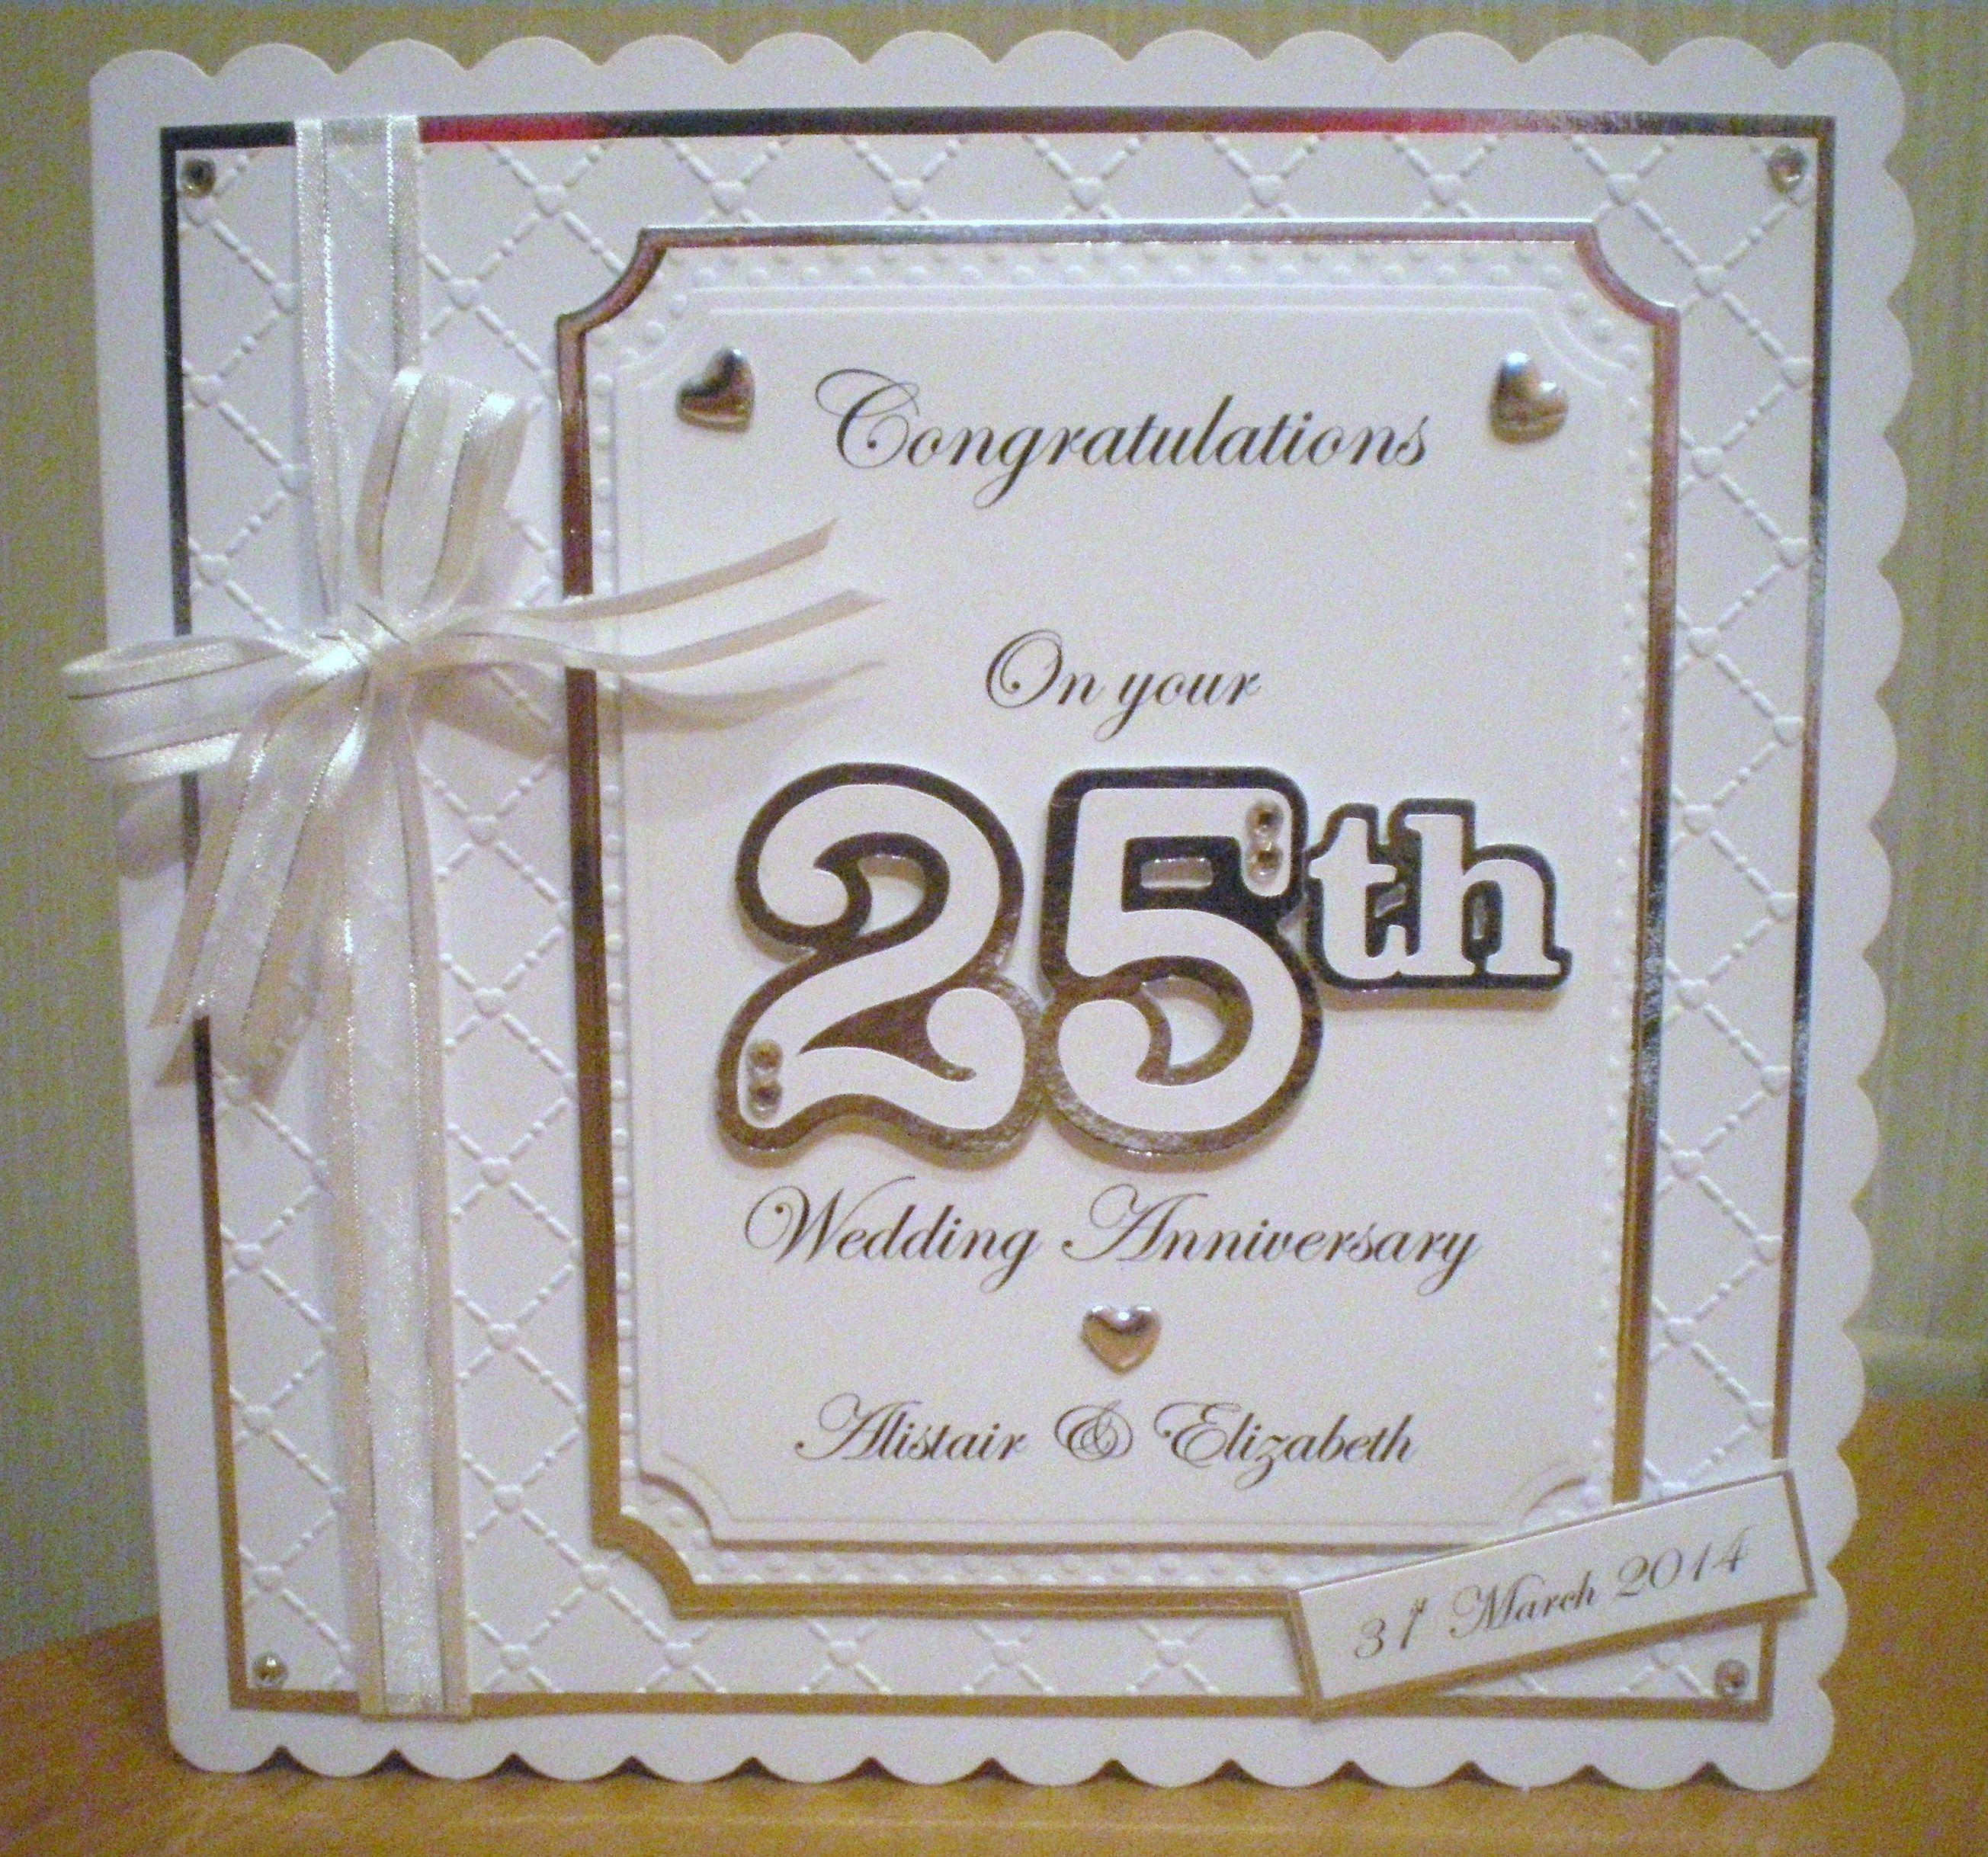 25th Anniversary Card Using Spellbinders And Cricut Design Make Wedding Invitations 50th Anniversary Cards Anniversary Cards Marriage Anniversary Cards